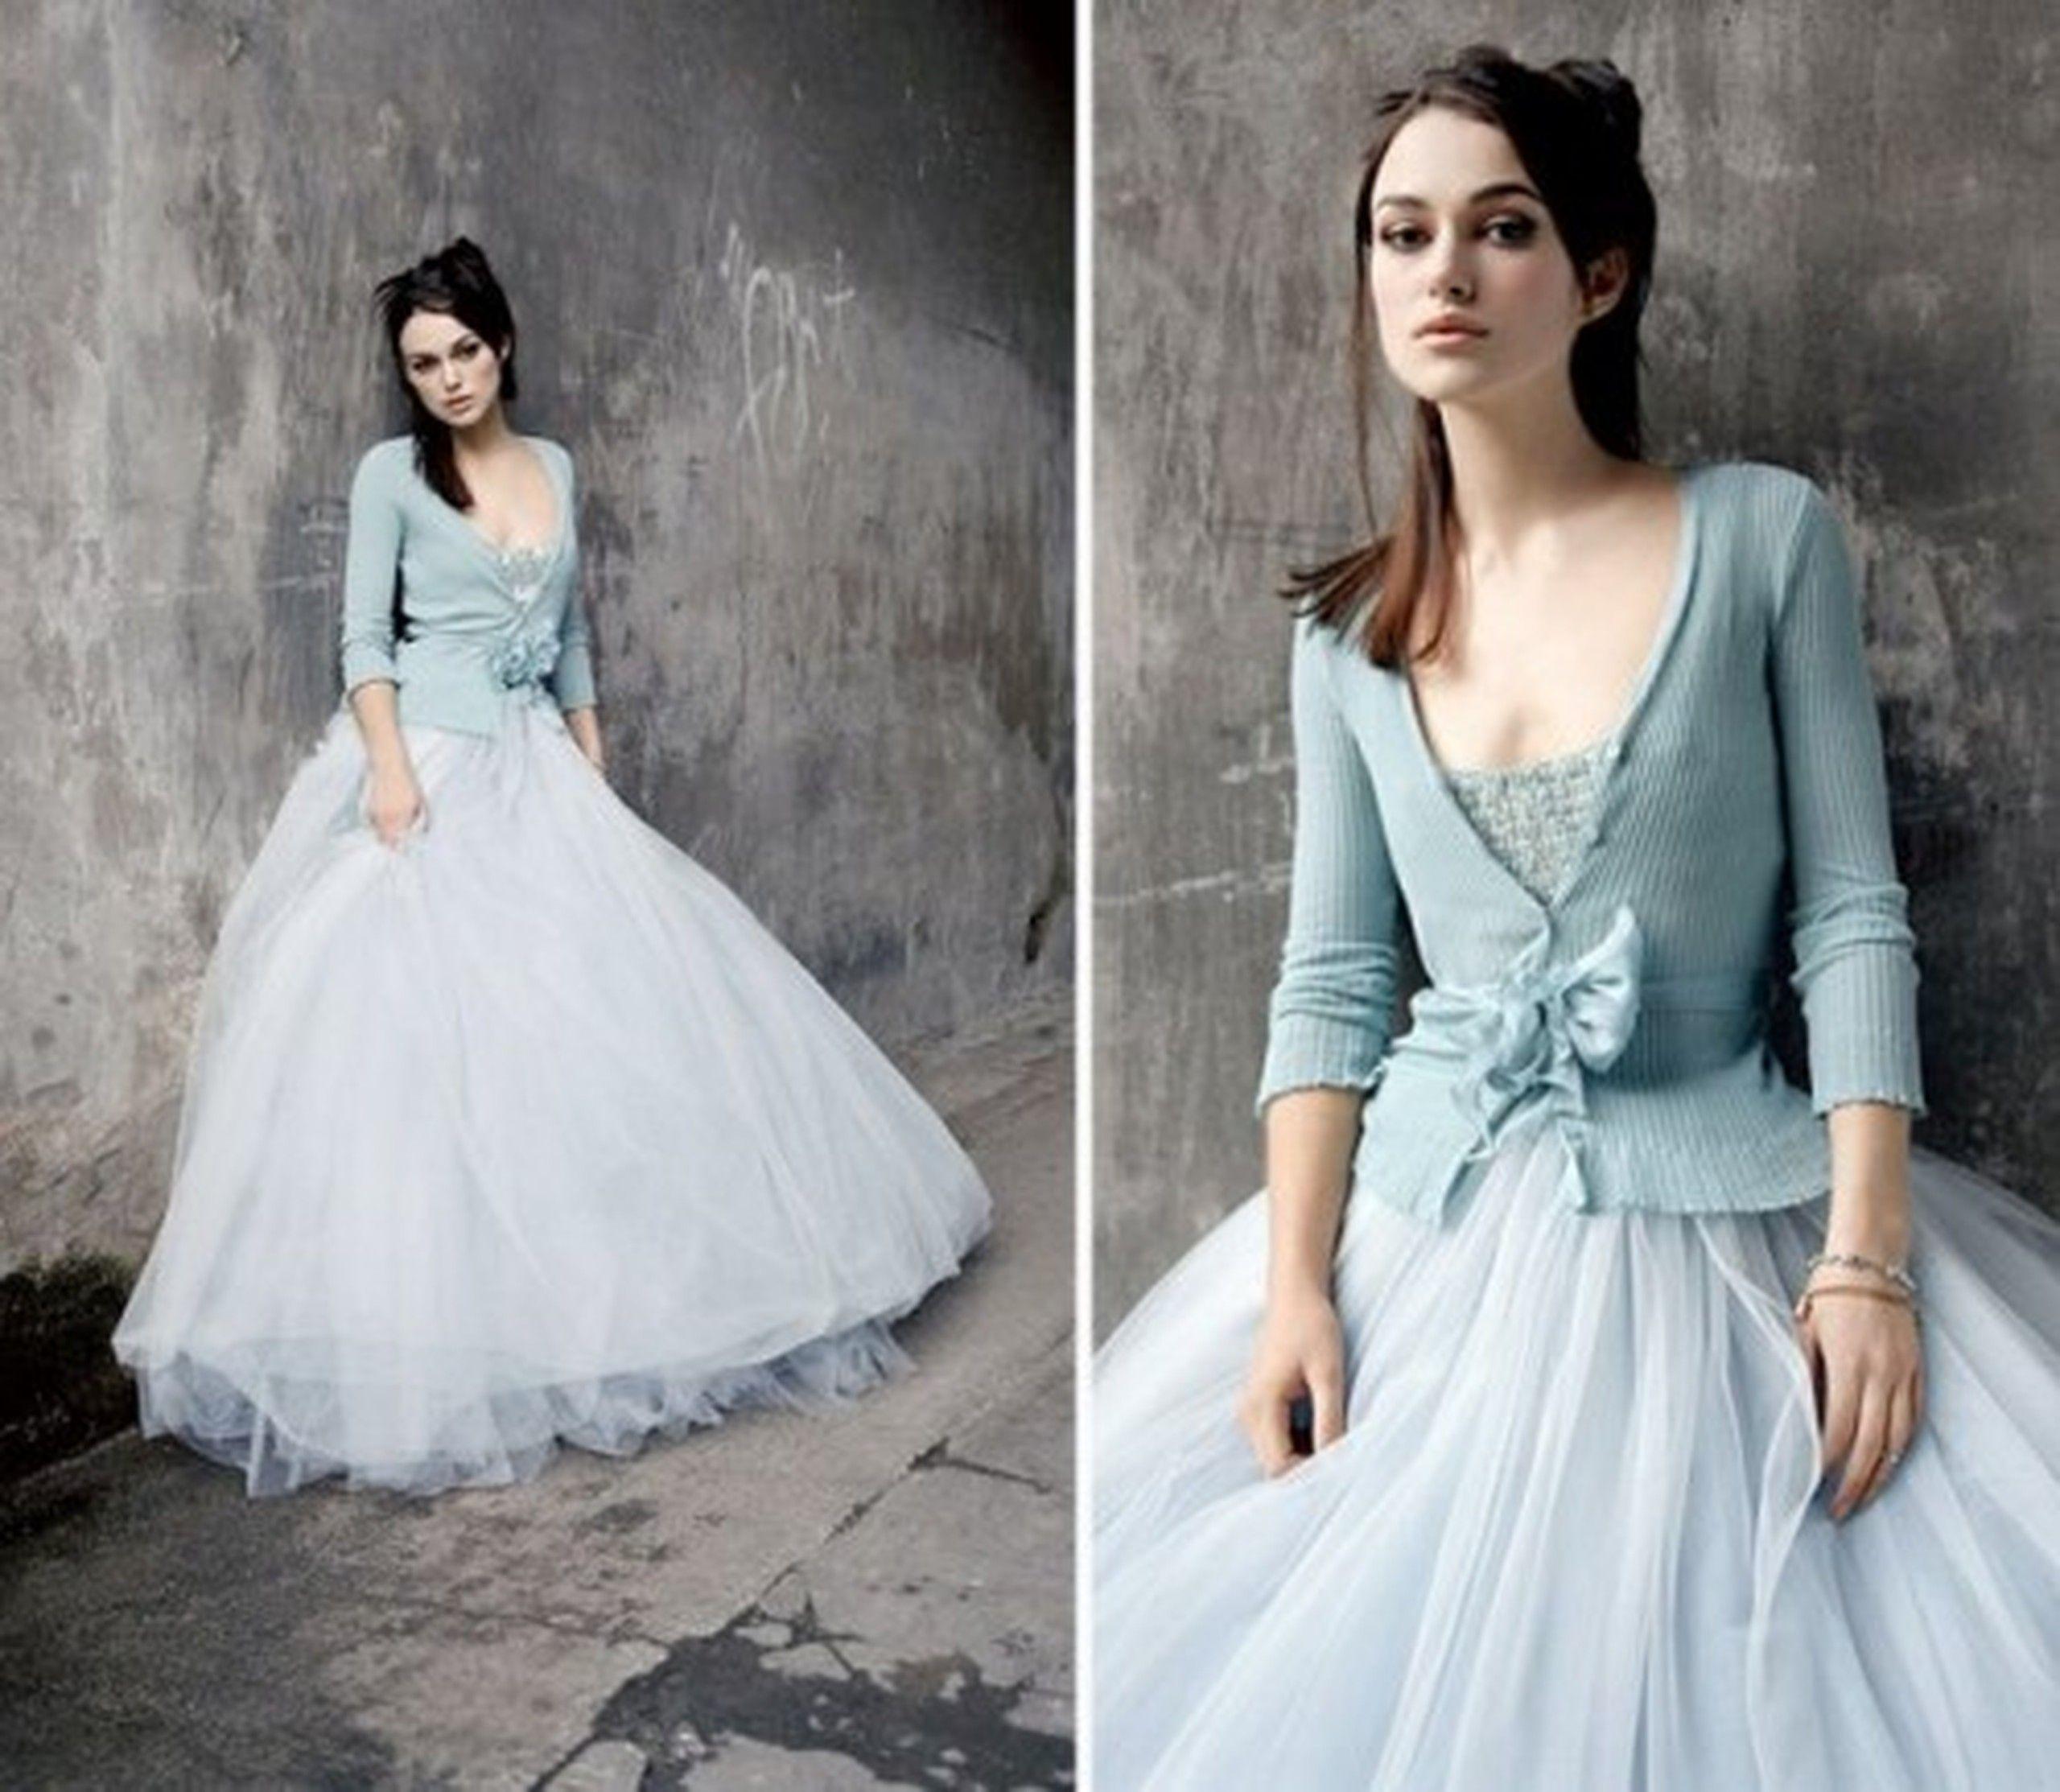 Winter wedding dress ideas coldweather clothing guide venuelust